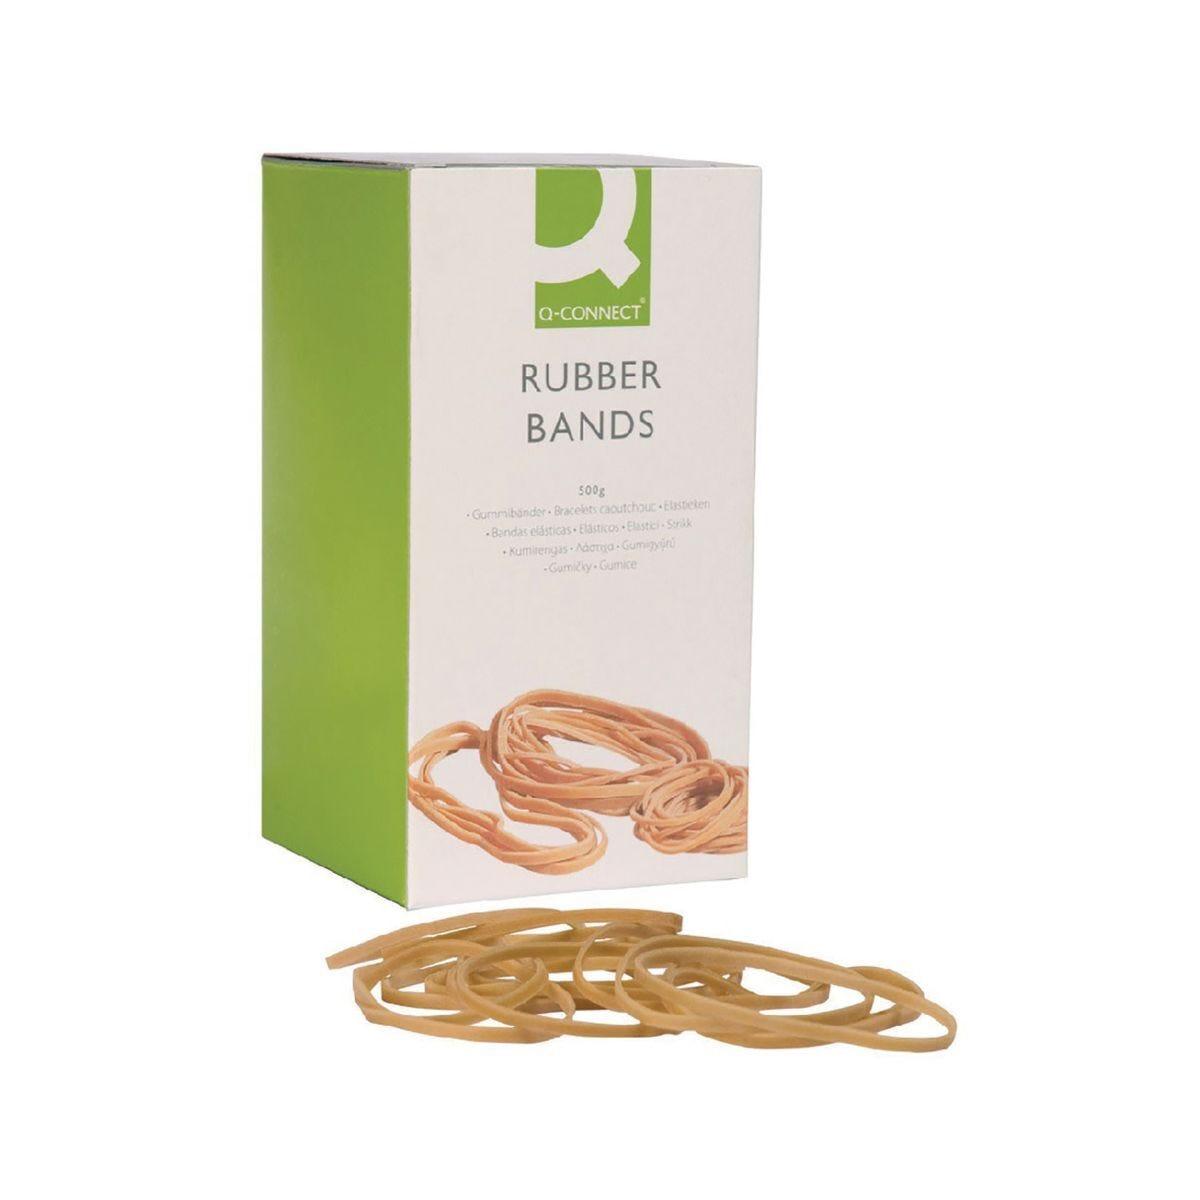 Q-Connect Rubber Bands 500g - No.19 88.9 x 1.6mm